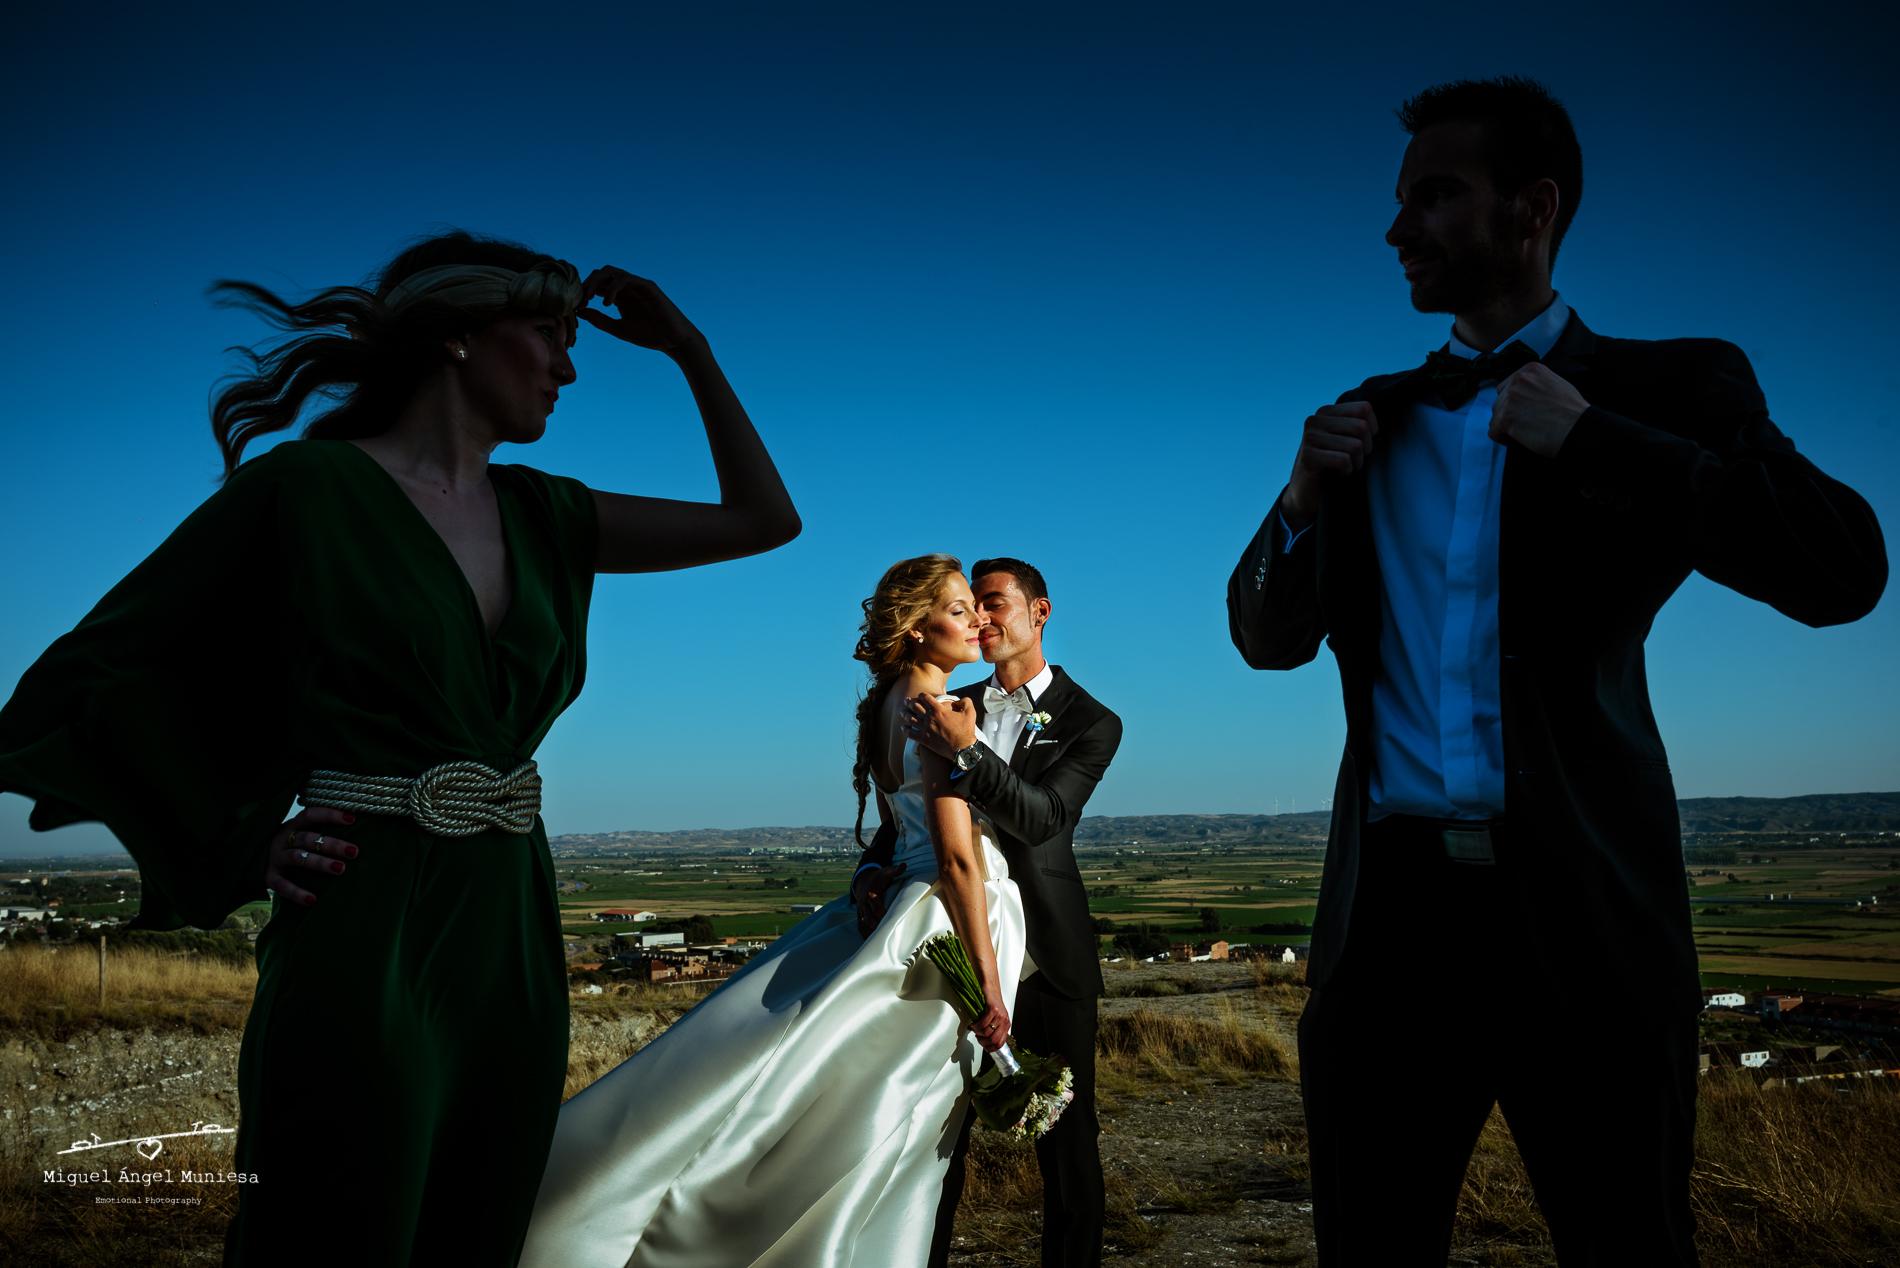 boda, fotografia de boda, boda zaragoza, fotografia, wedding, wedding photography, miguel angel muniesa, fotografo boda Zaragoza, fotografo boda, destination wedding_ 035